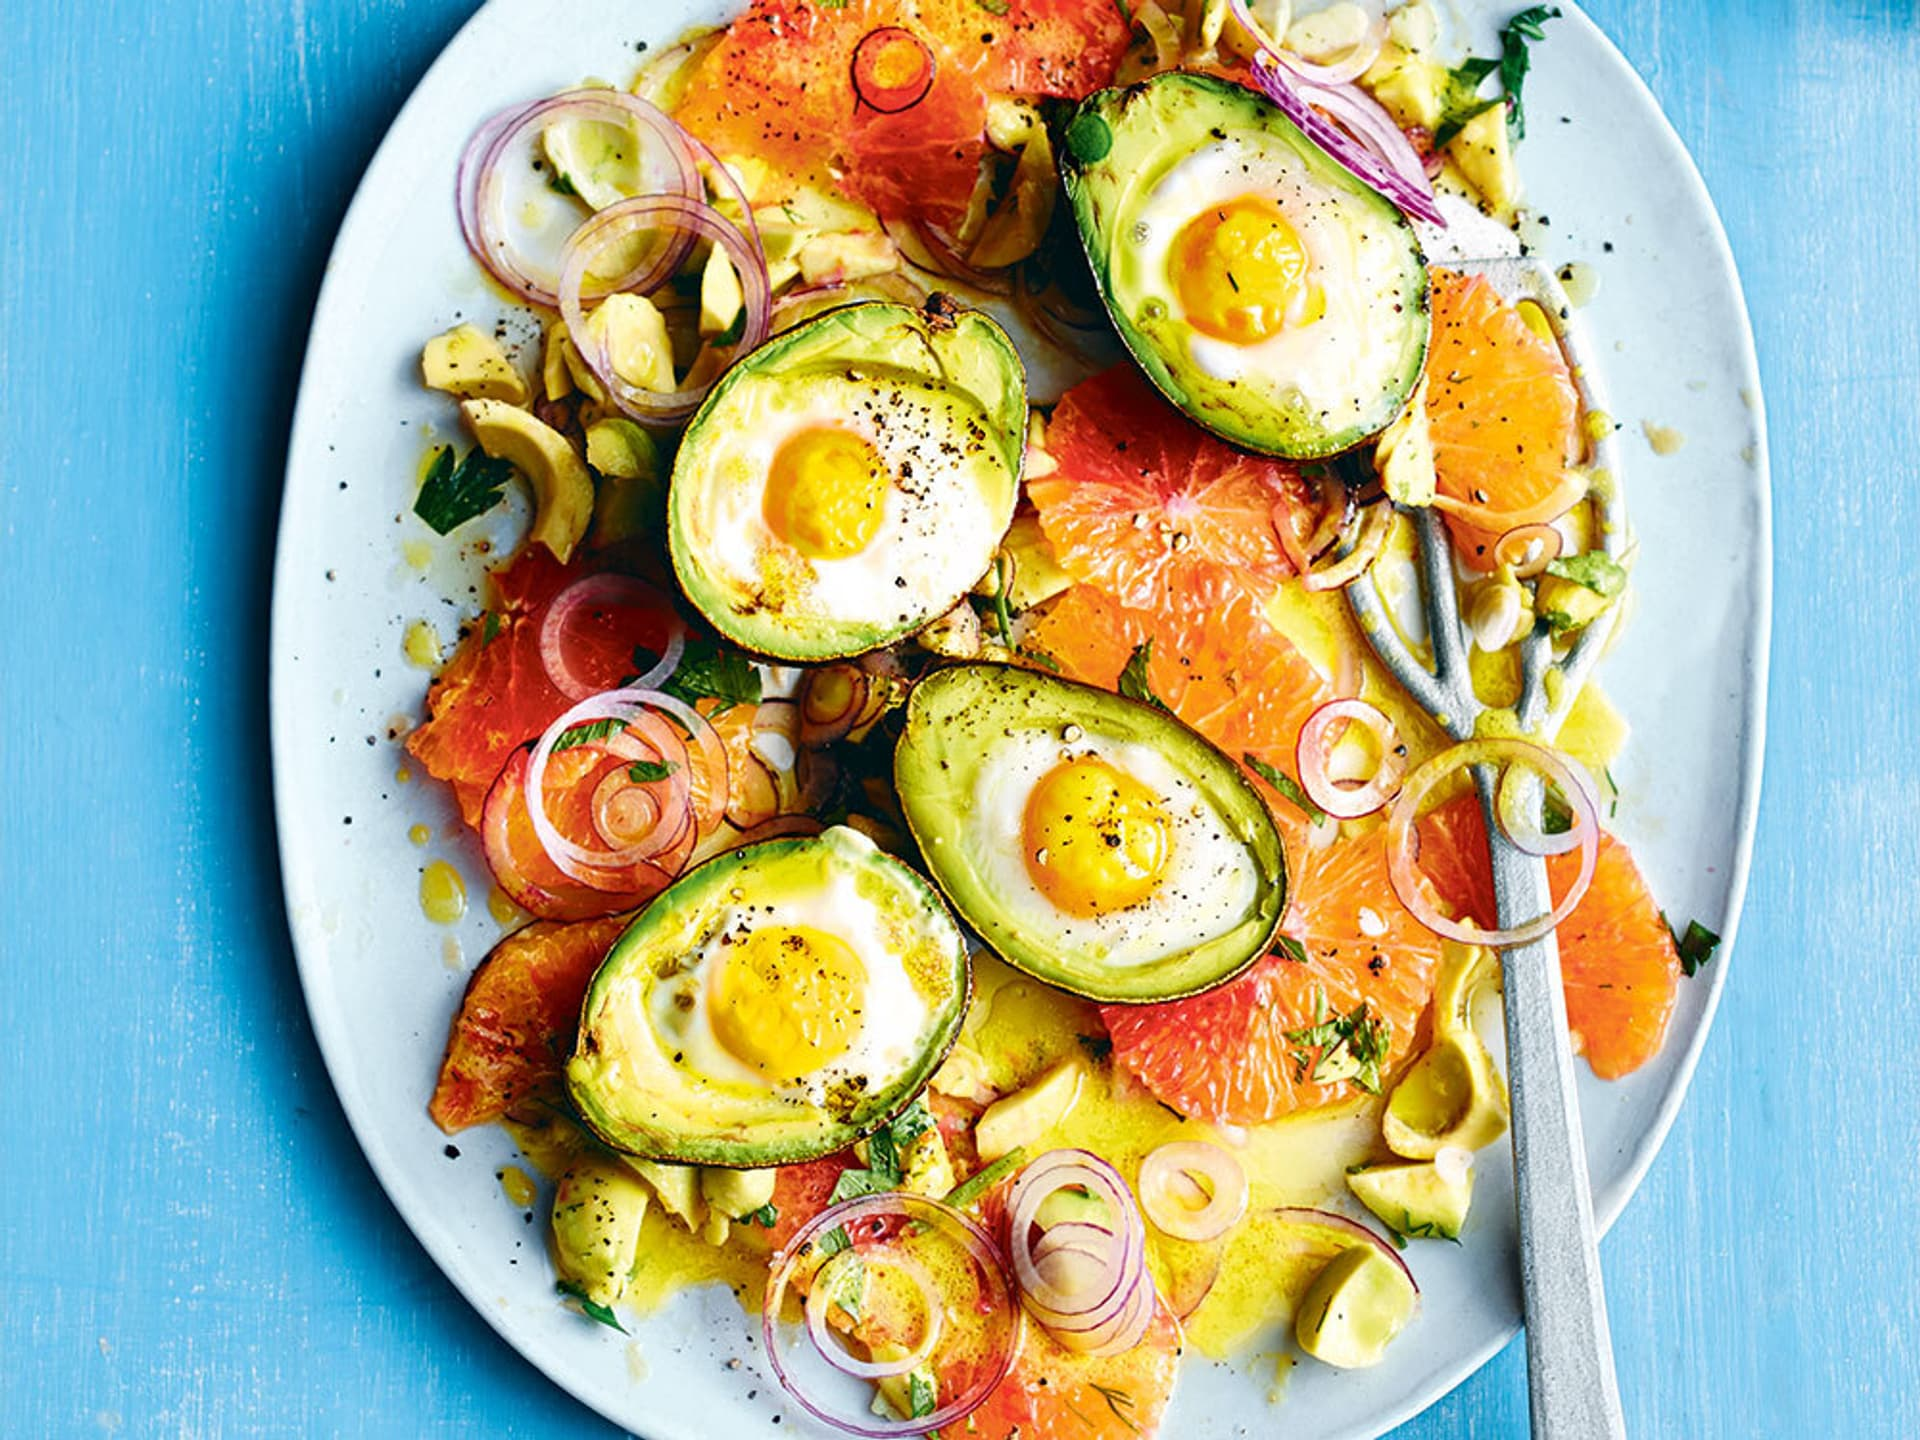 Avocado eier mit blutorangensalat